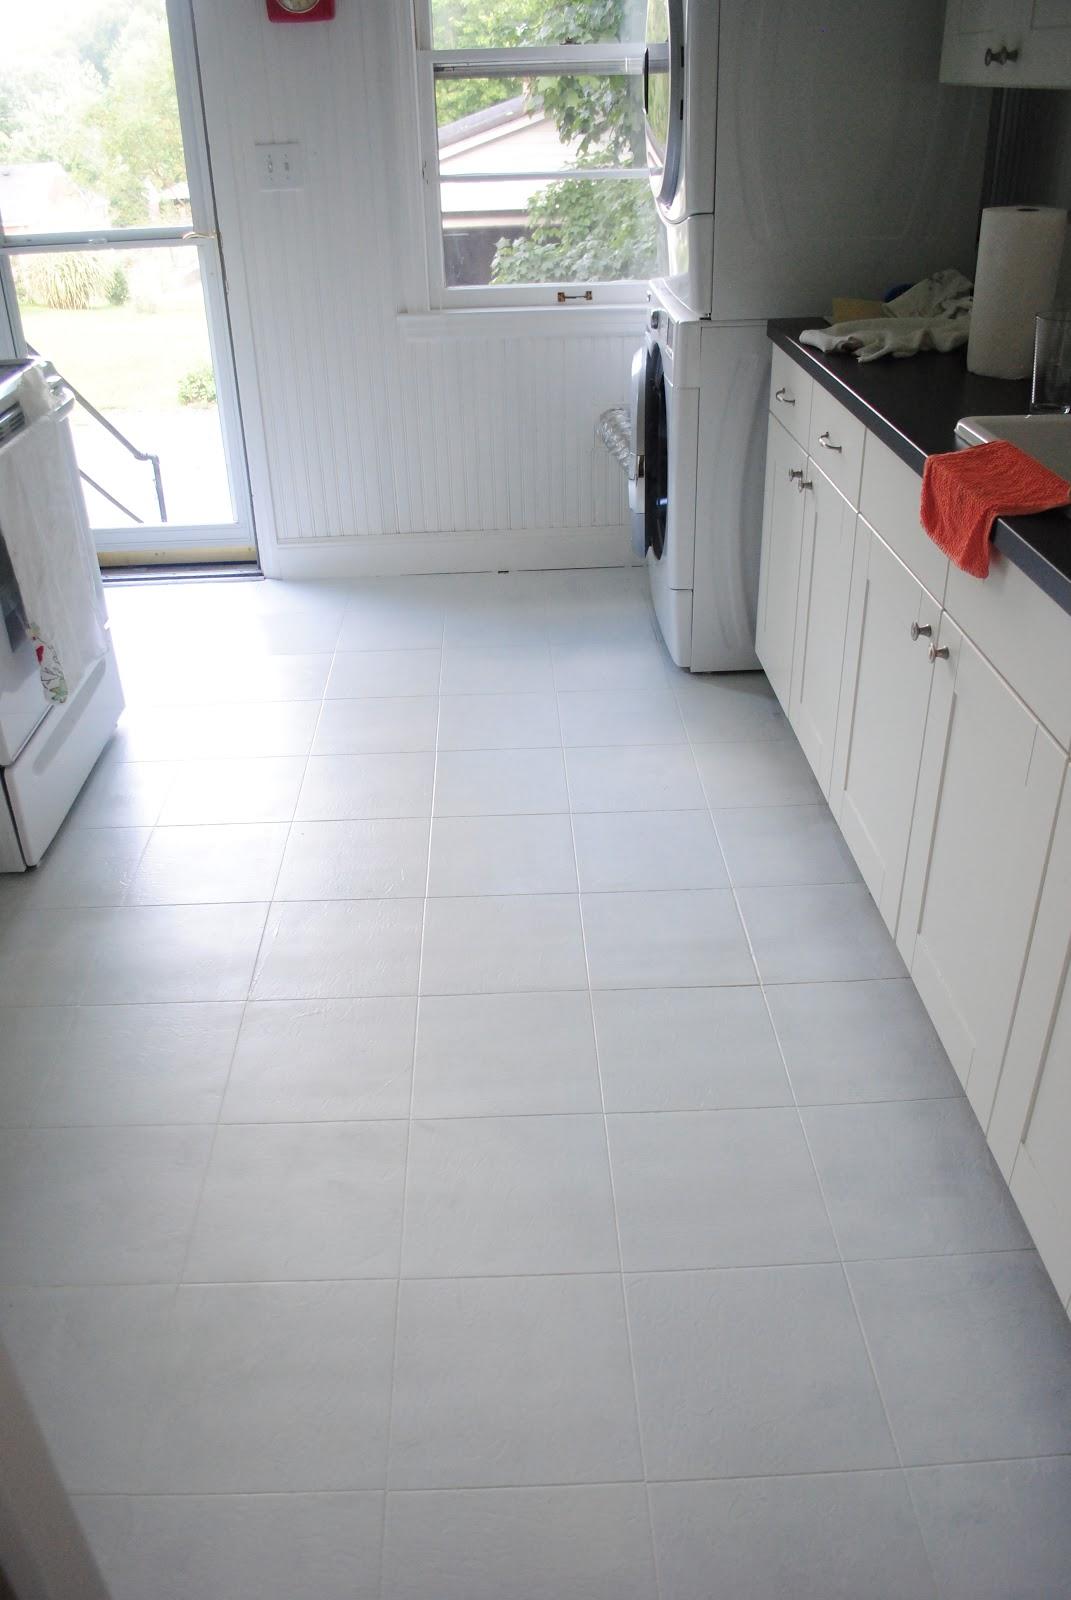 Ruffles rhythms painted vinyl floors for What to use on vinyl floors